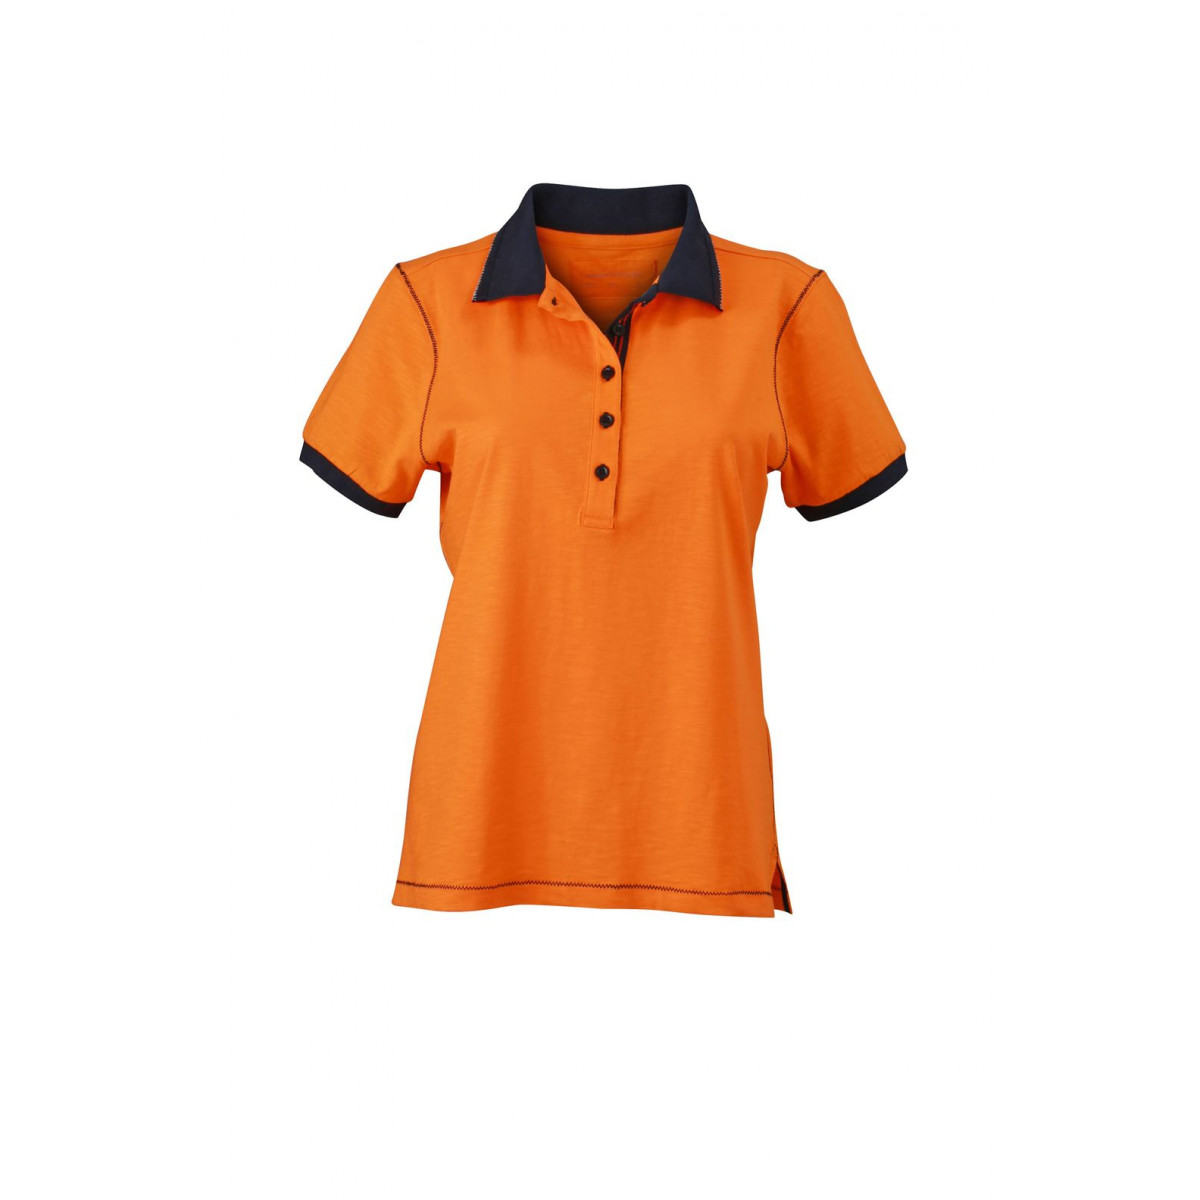 Рубашка поло женская JN979 Ladies Urban Polo - Оранжевый/Темно-синий